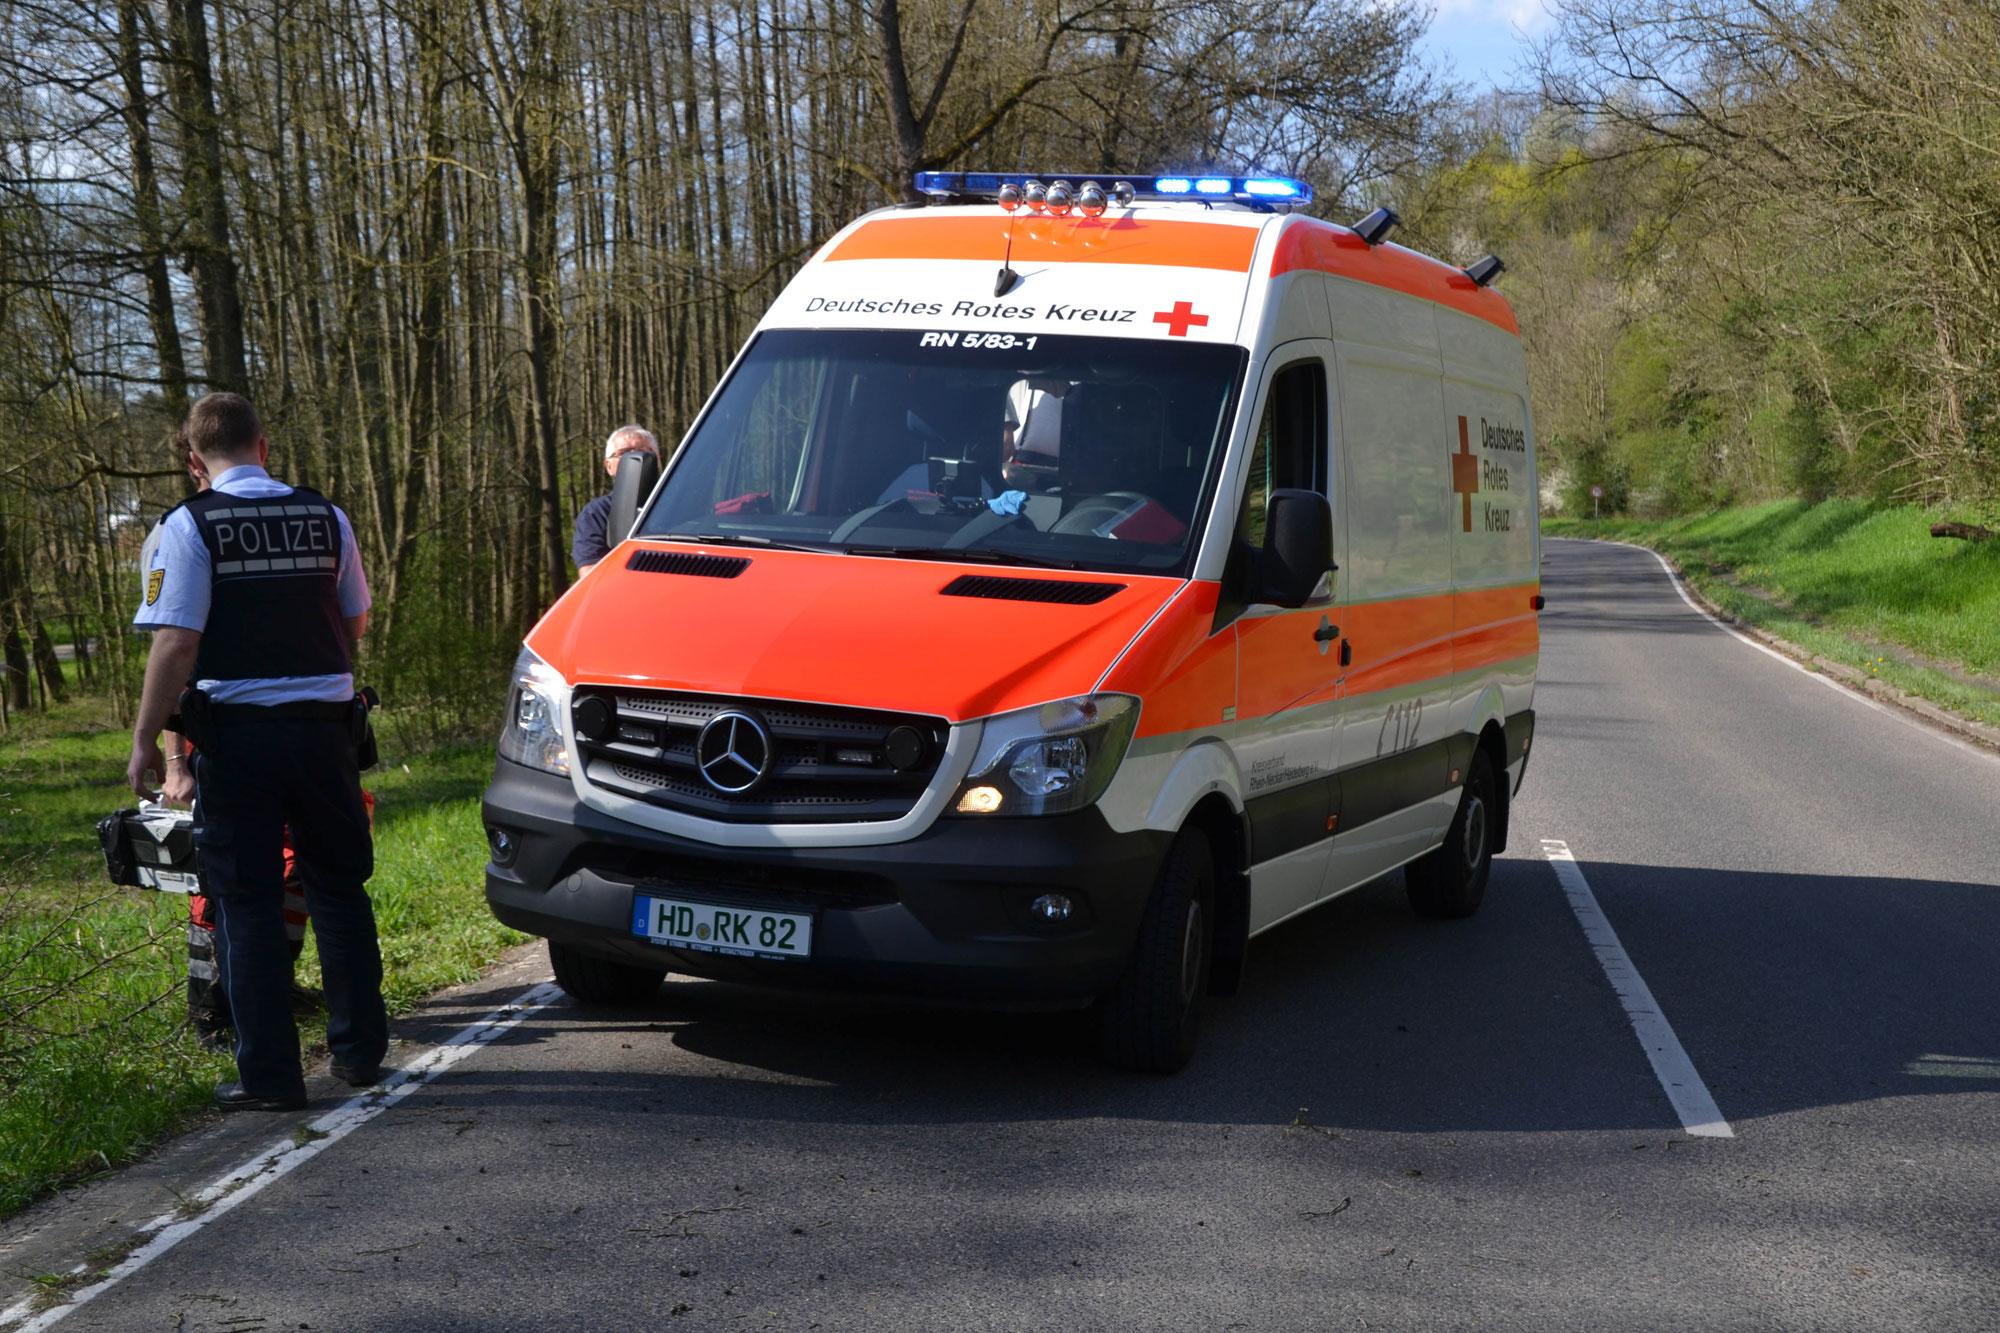 Gem. Dielheim: Motorradfahrerin bei Auffahrunfall verletzt